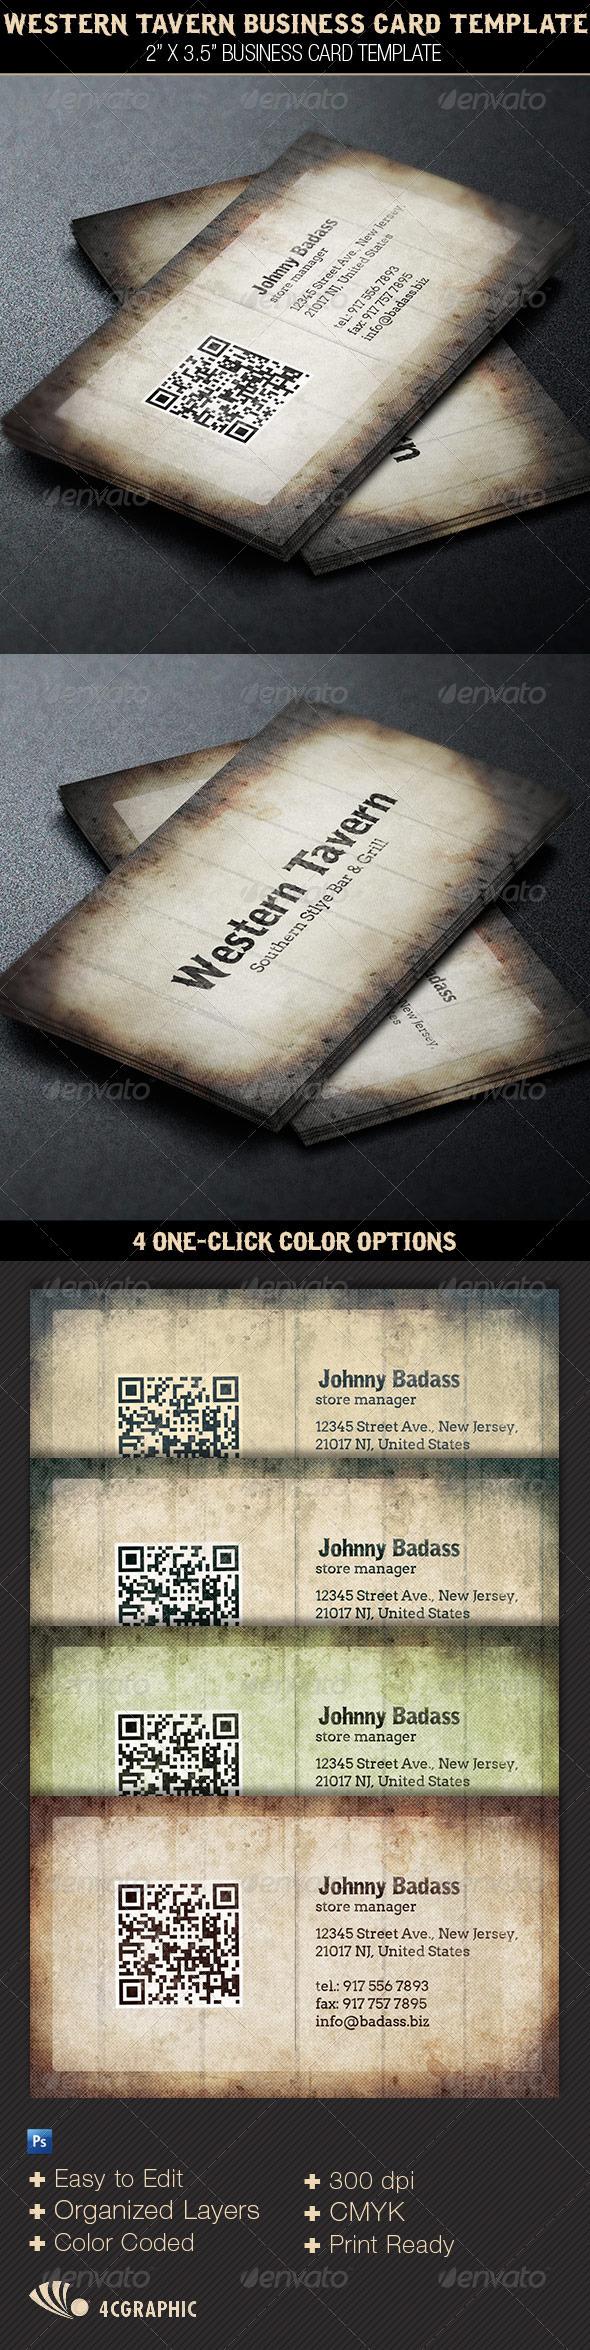 Western Tavern Business Card Template